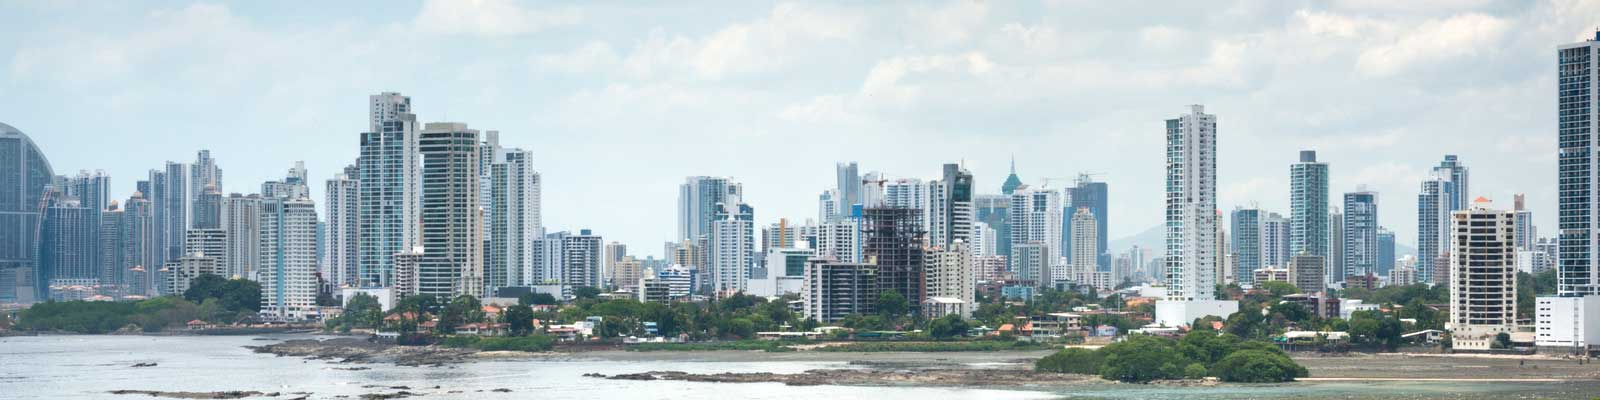 Panama Paisagem Cidade e Mar  Residencial, Comercial, Terrenos. A venda, ou para Alugar.